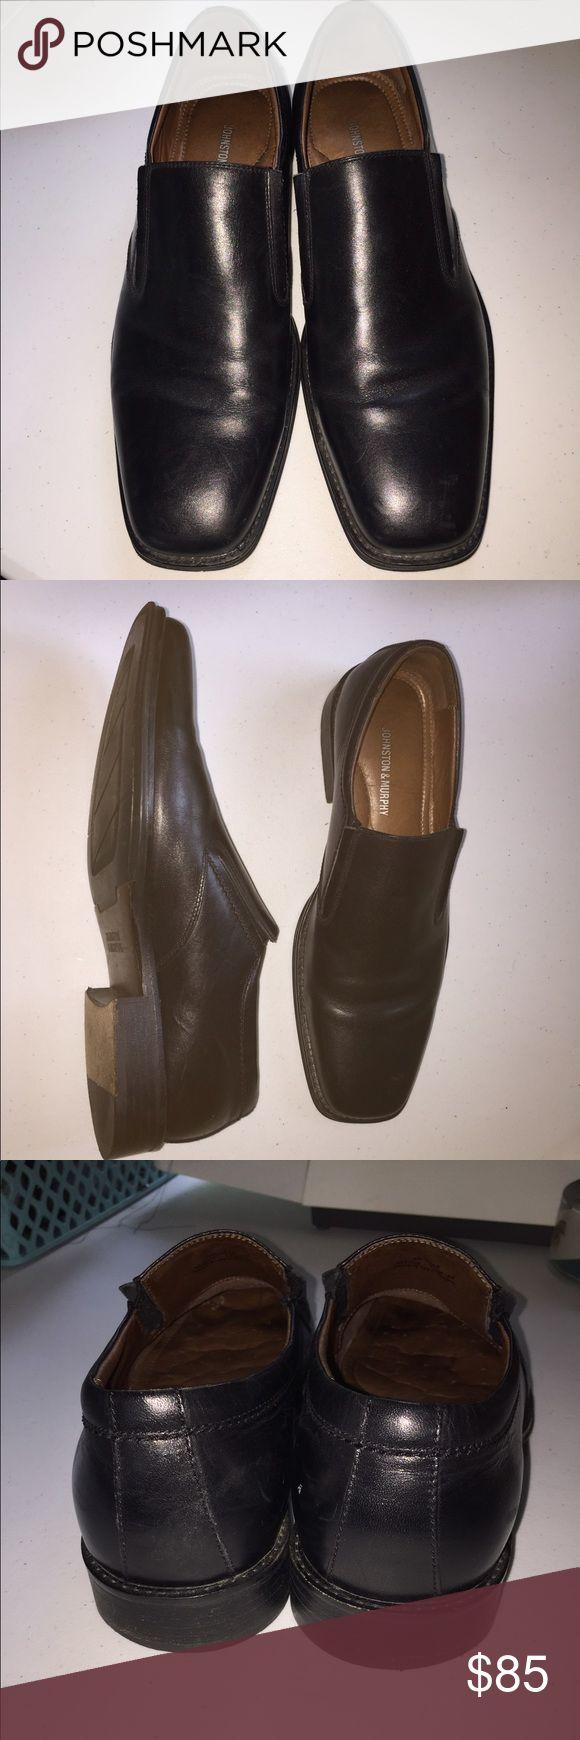 Johnston & Murphy slip on loafers! Men's Johnston & Murphy slip on loafers. Leather! EUC! Can hardly tell these were ever worn except for the slight wear on sole! Awesome shoes! Johnston & Murphy Shoes Loafers & Slip-Ons